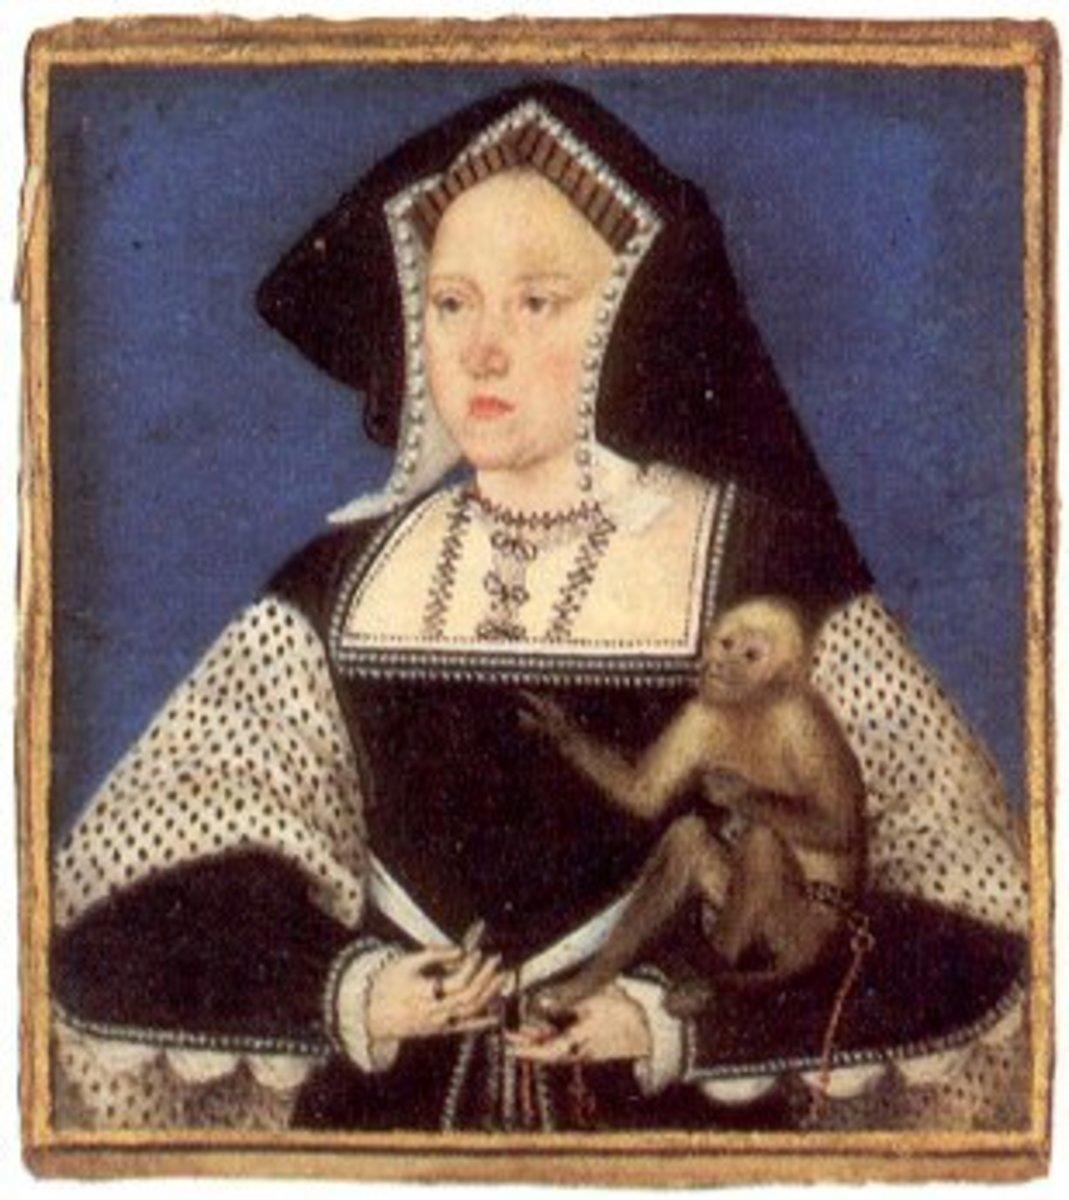 A miniature of Katherine holding a monkey.